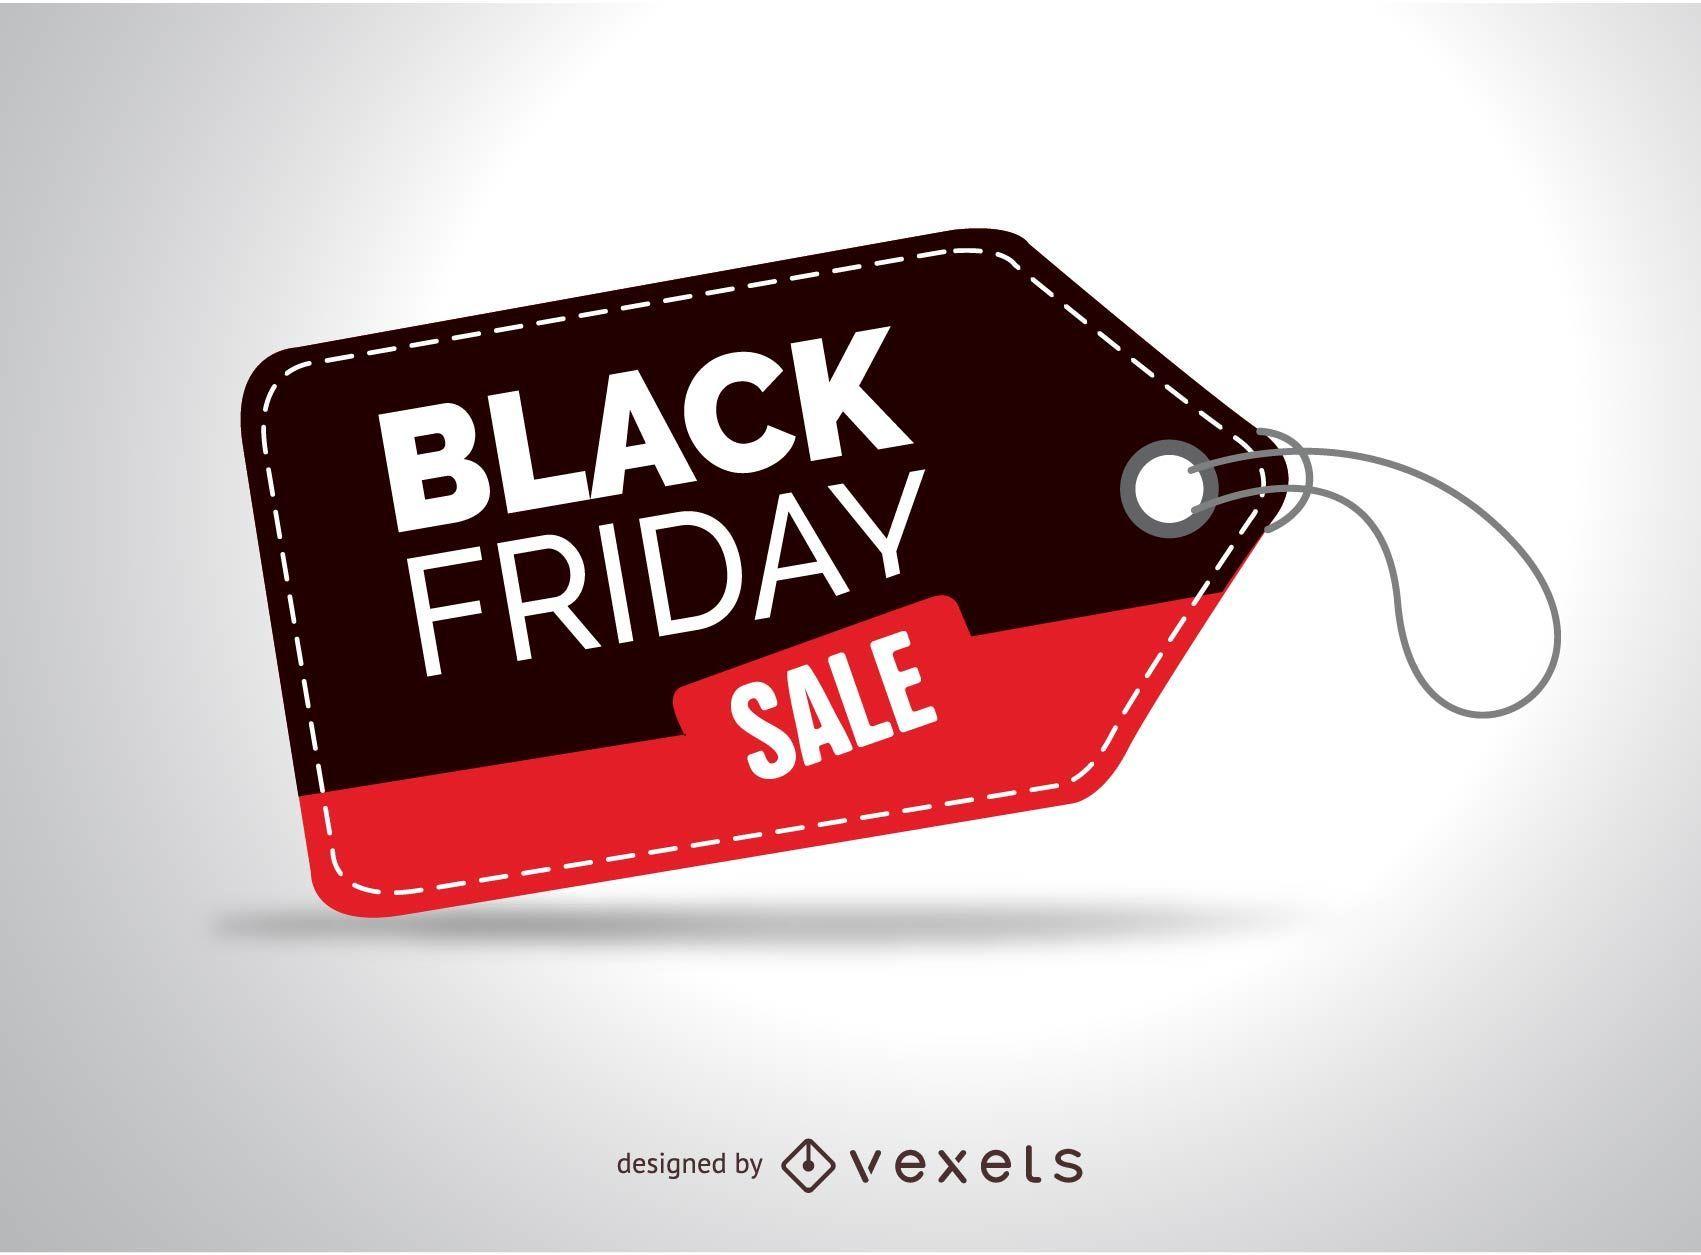 Etiqueta de venda Black Friday